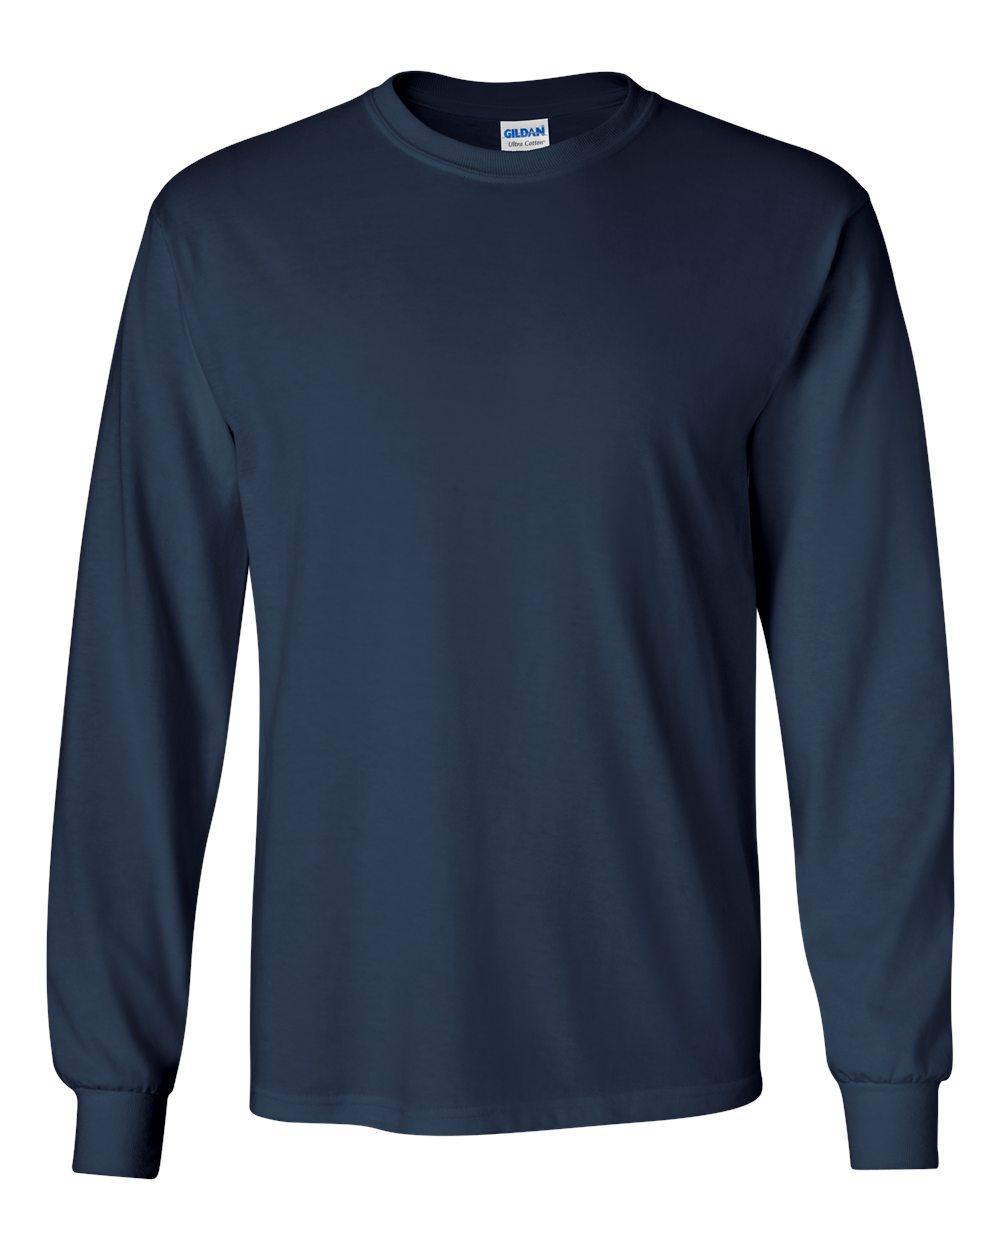 2b758aa0945 GILDAN Ultra Cotton Long Sleeve T